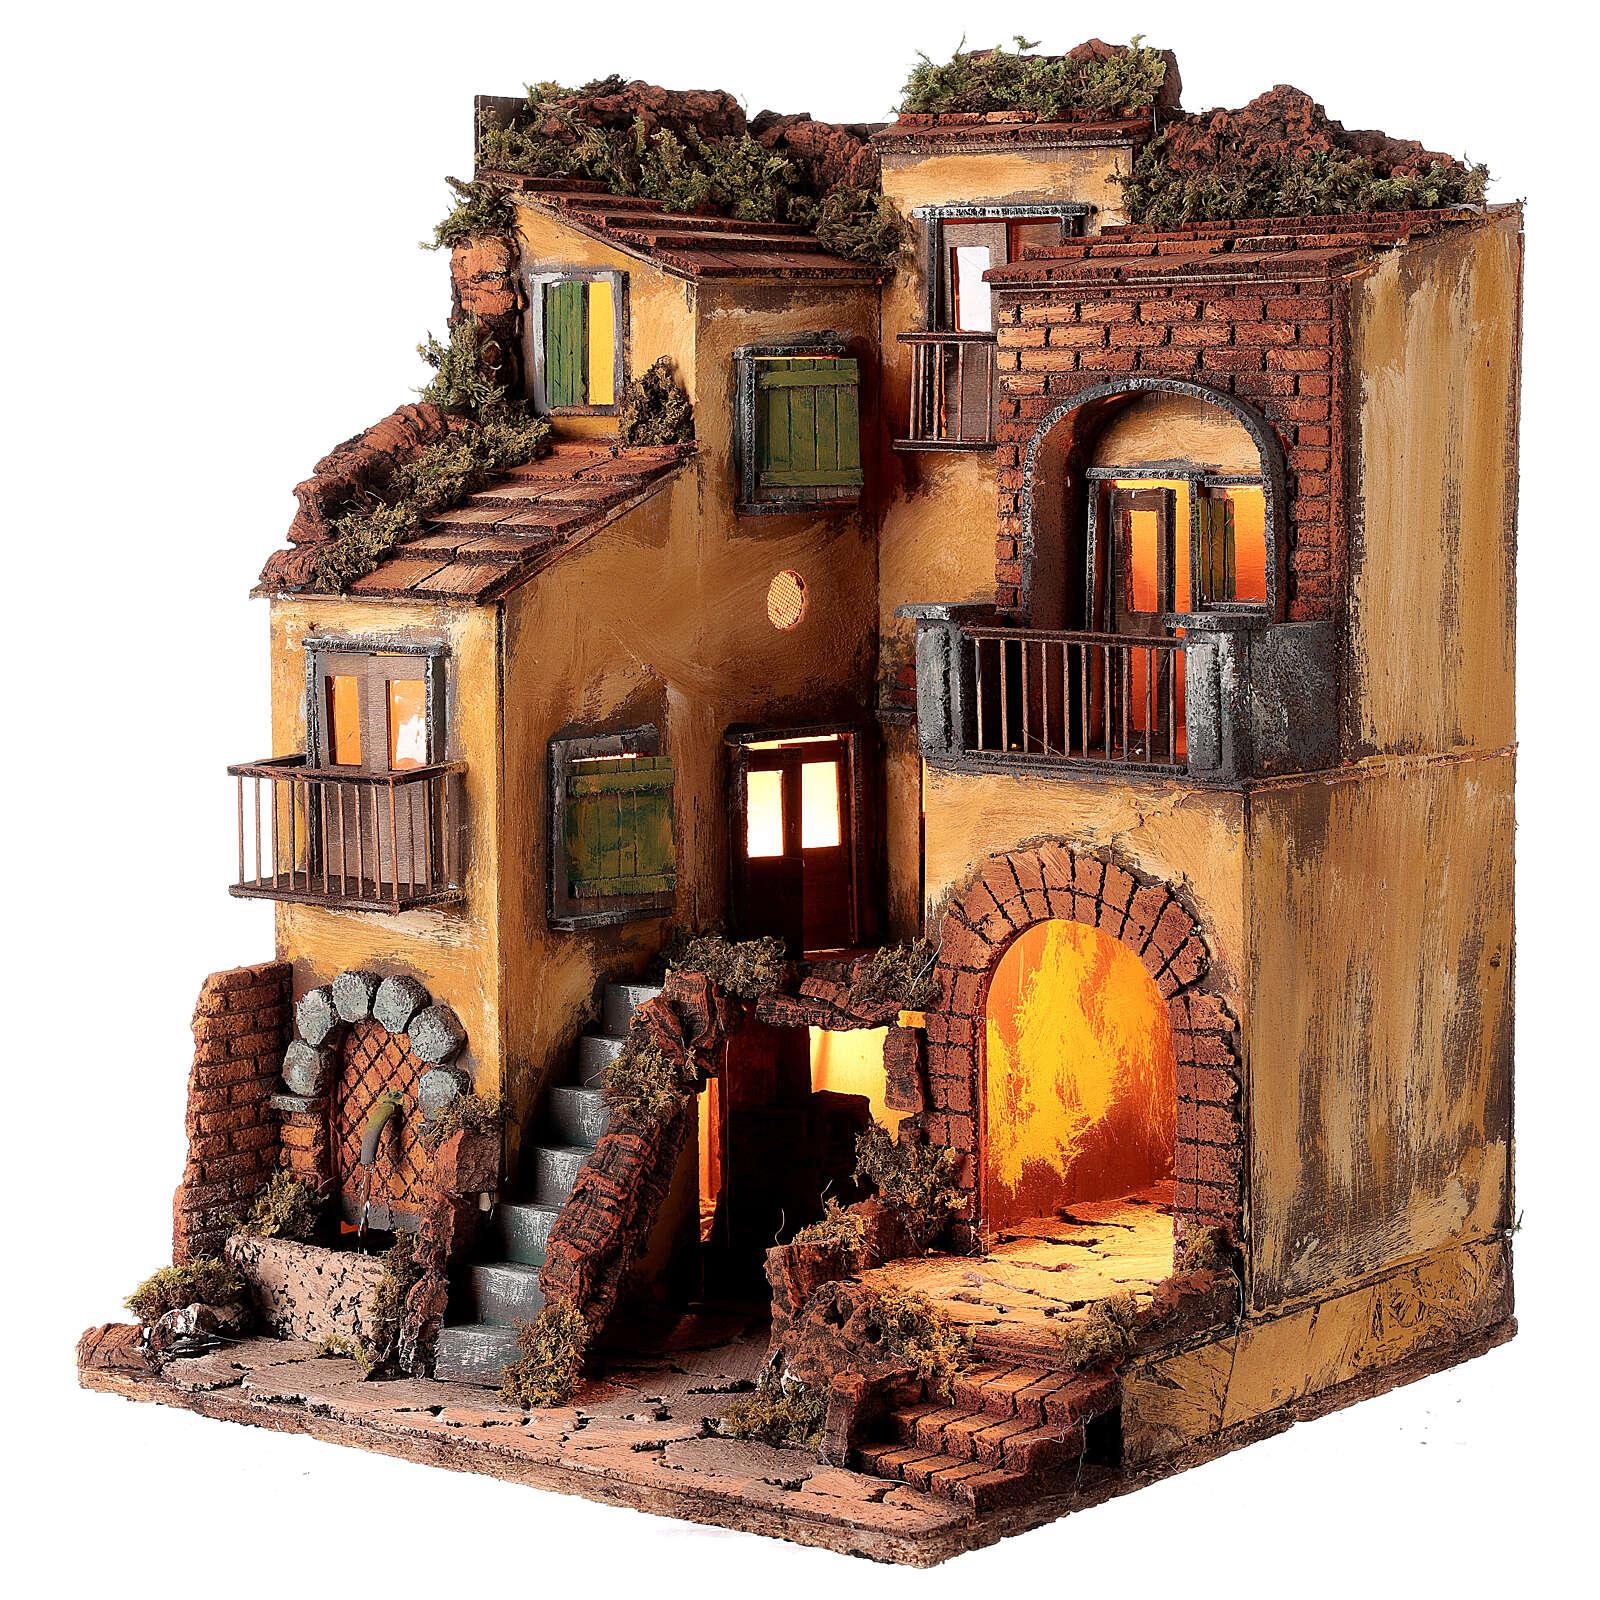 Borgo presepe napoletano stile 700 e fontana cm 50x40x44 4